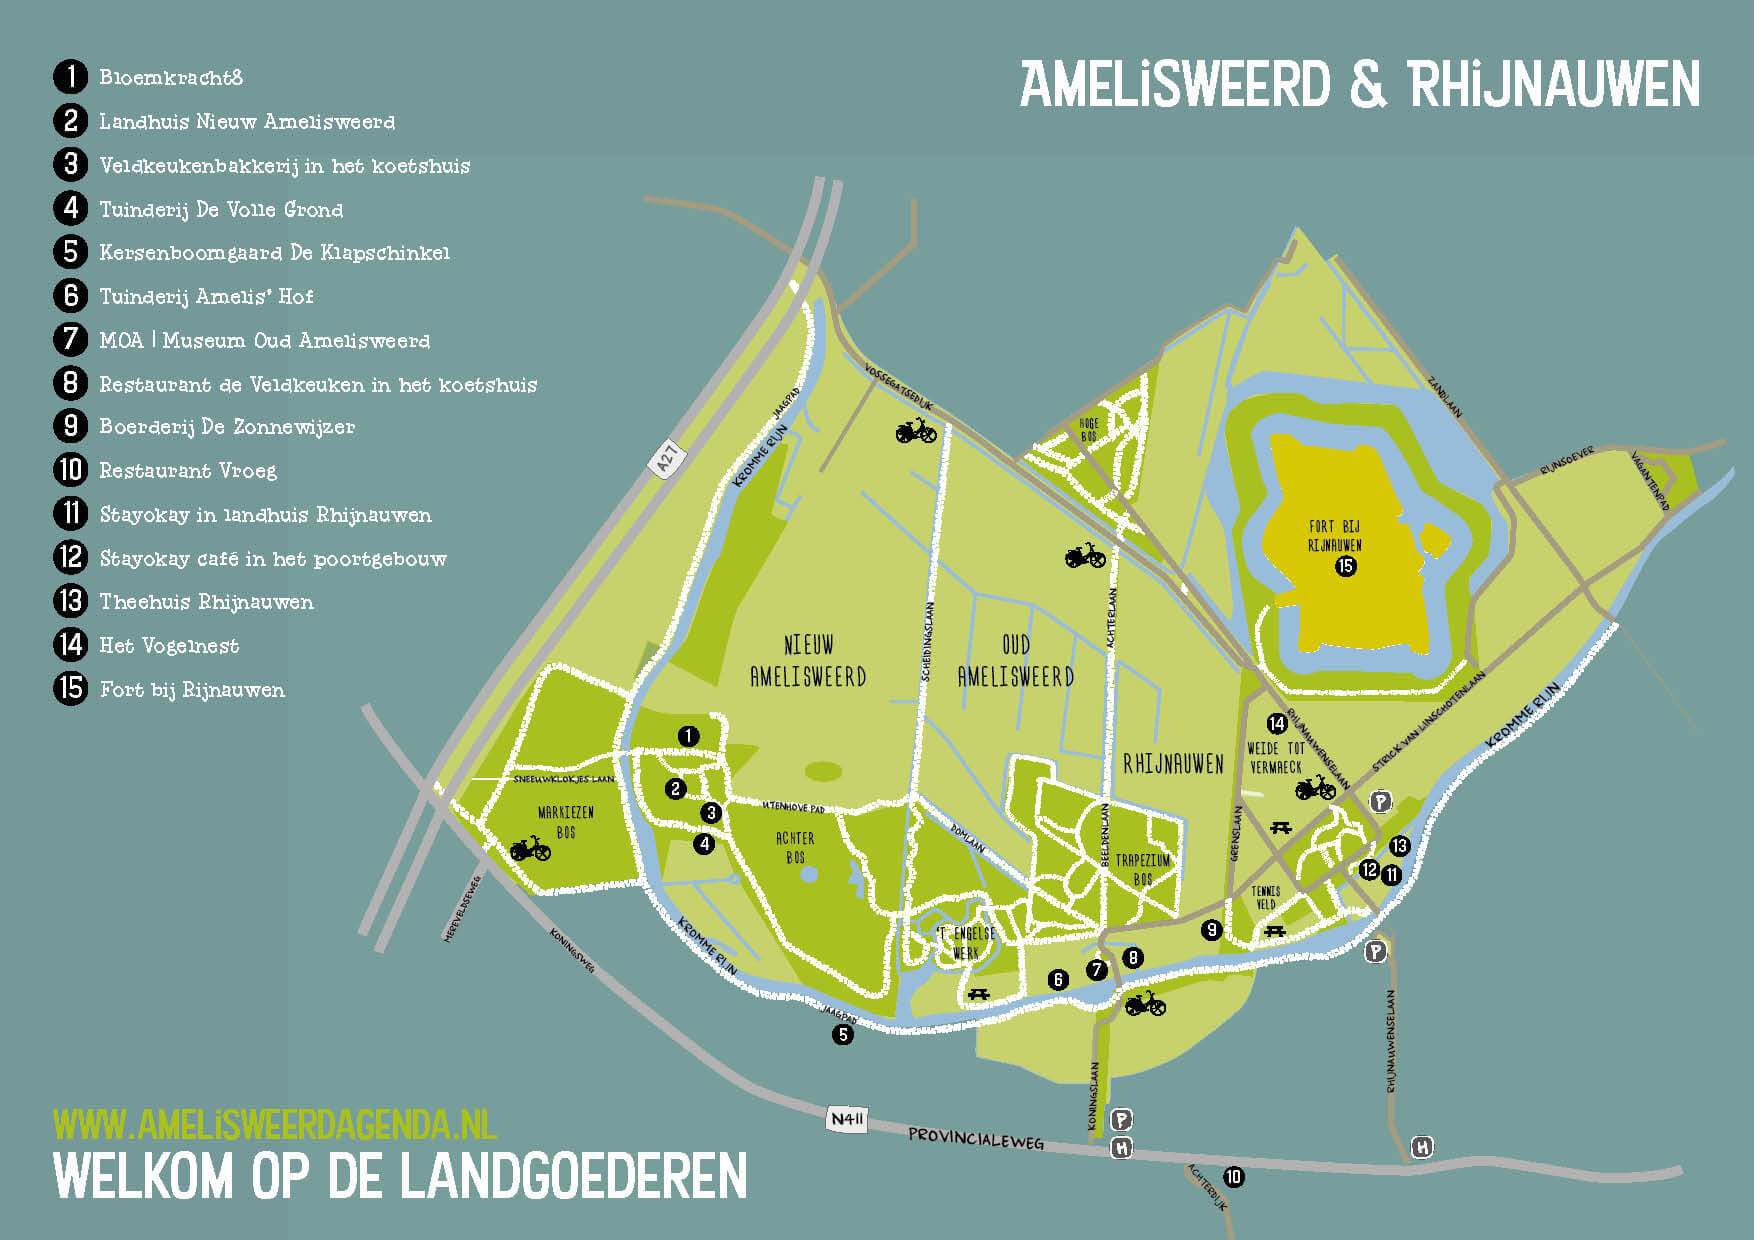 Plattegrond Amelisweerd & Rhijnauwen